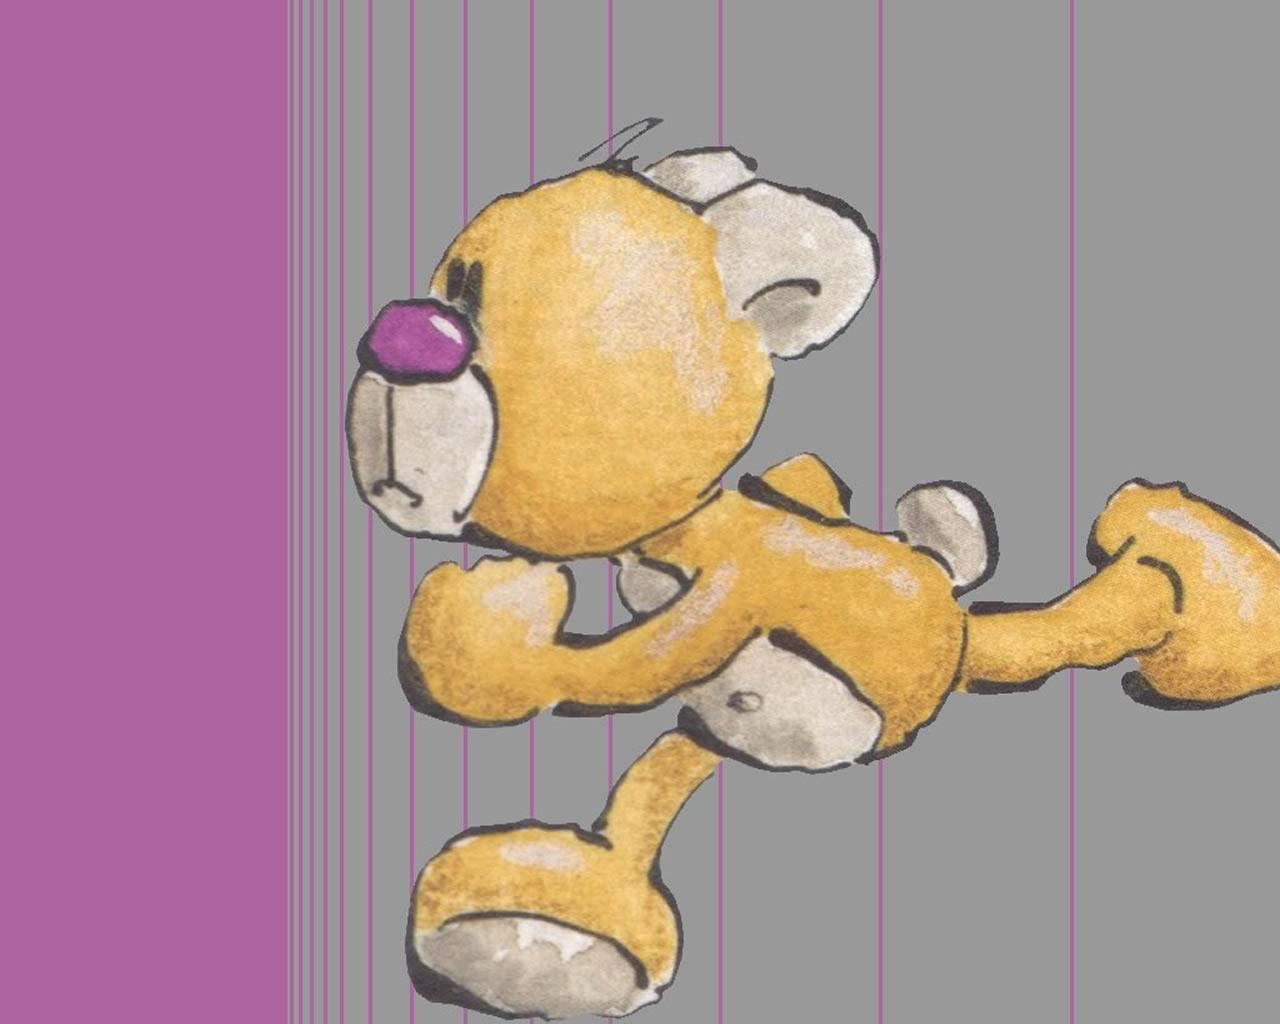 download wallpaper: Pimboli – paars wallpaper